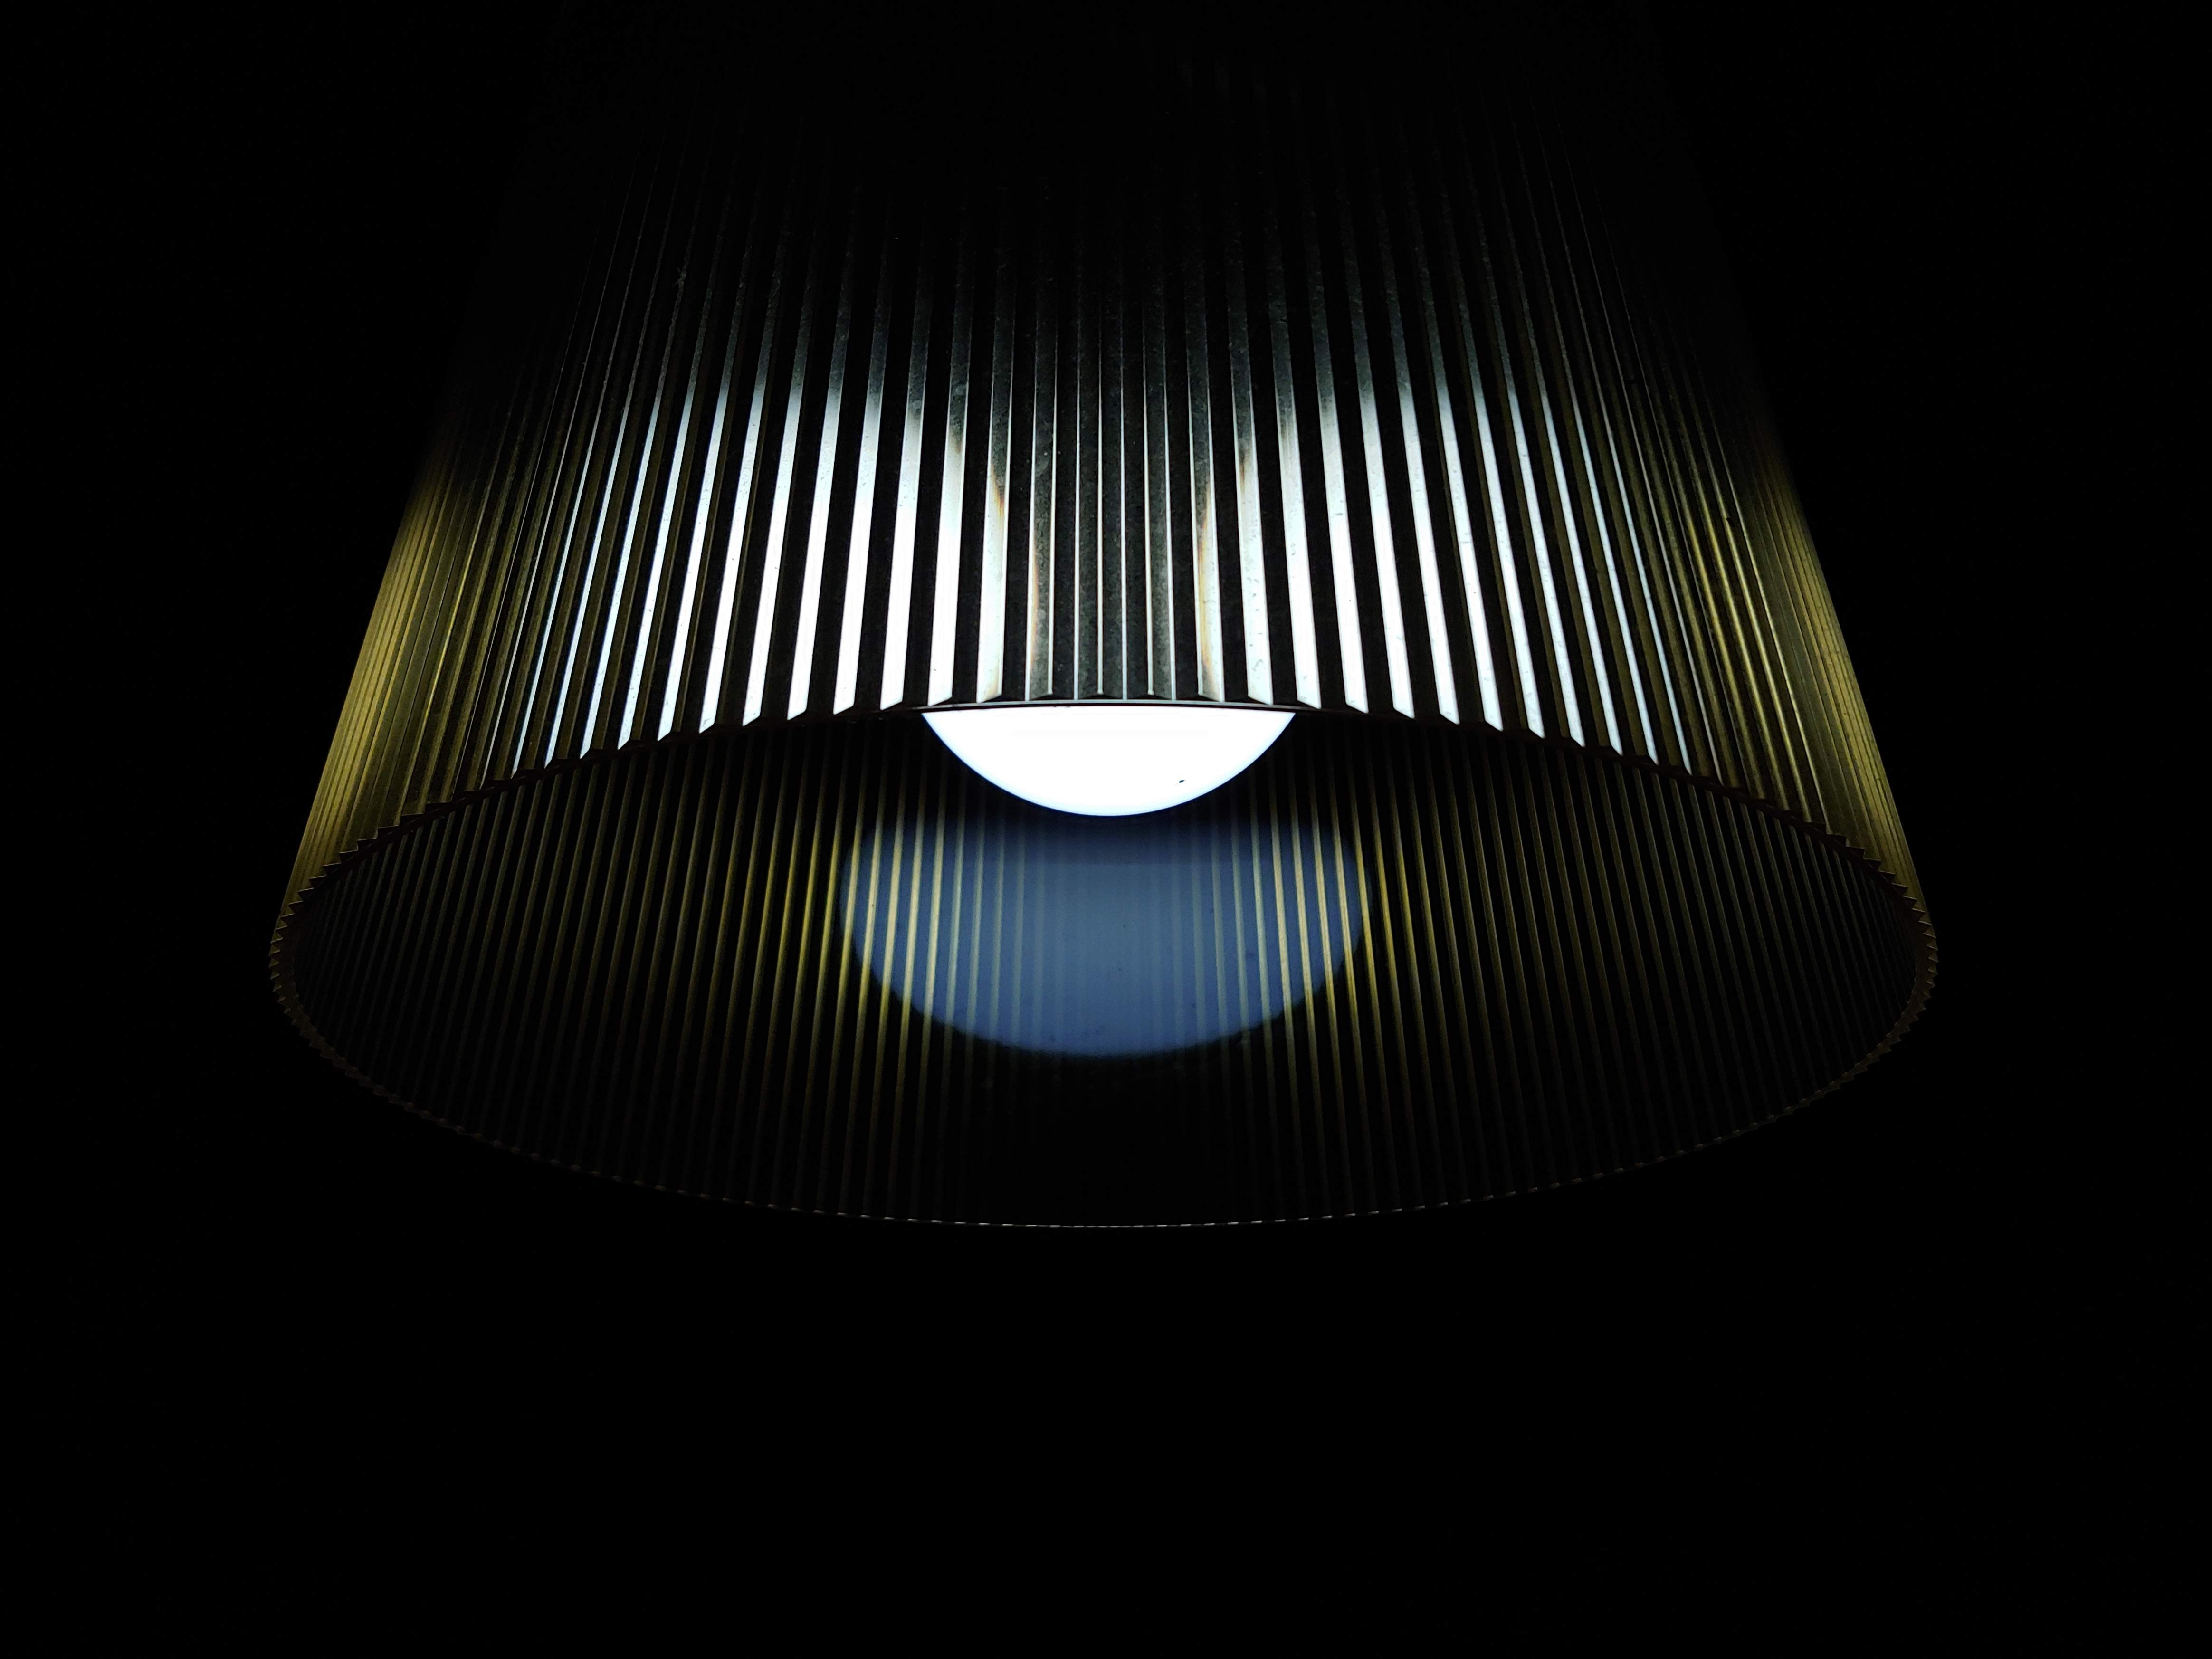 filippo miscioscia U7P5wG7OBjU unsplash - Få styr på dine LED pærer